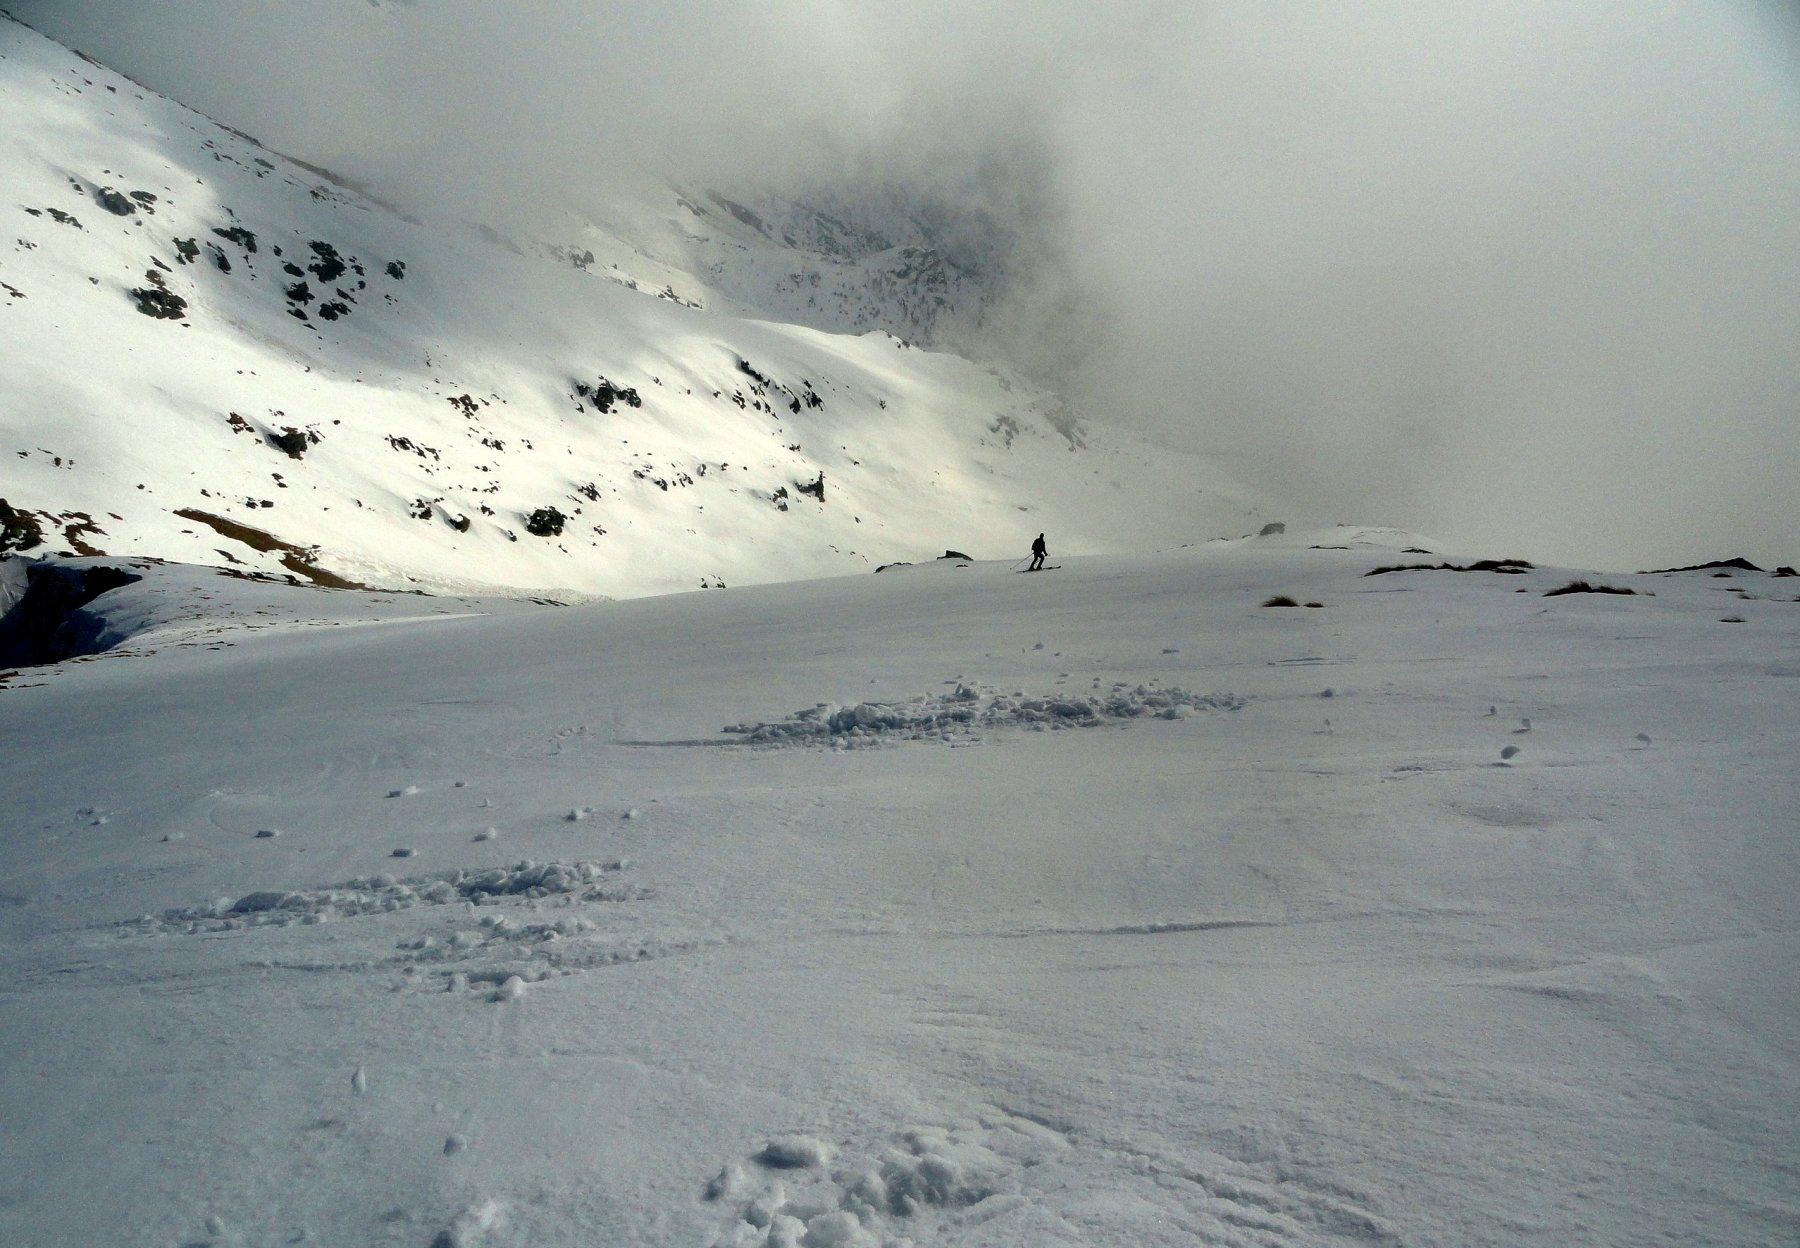 splendida sciata